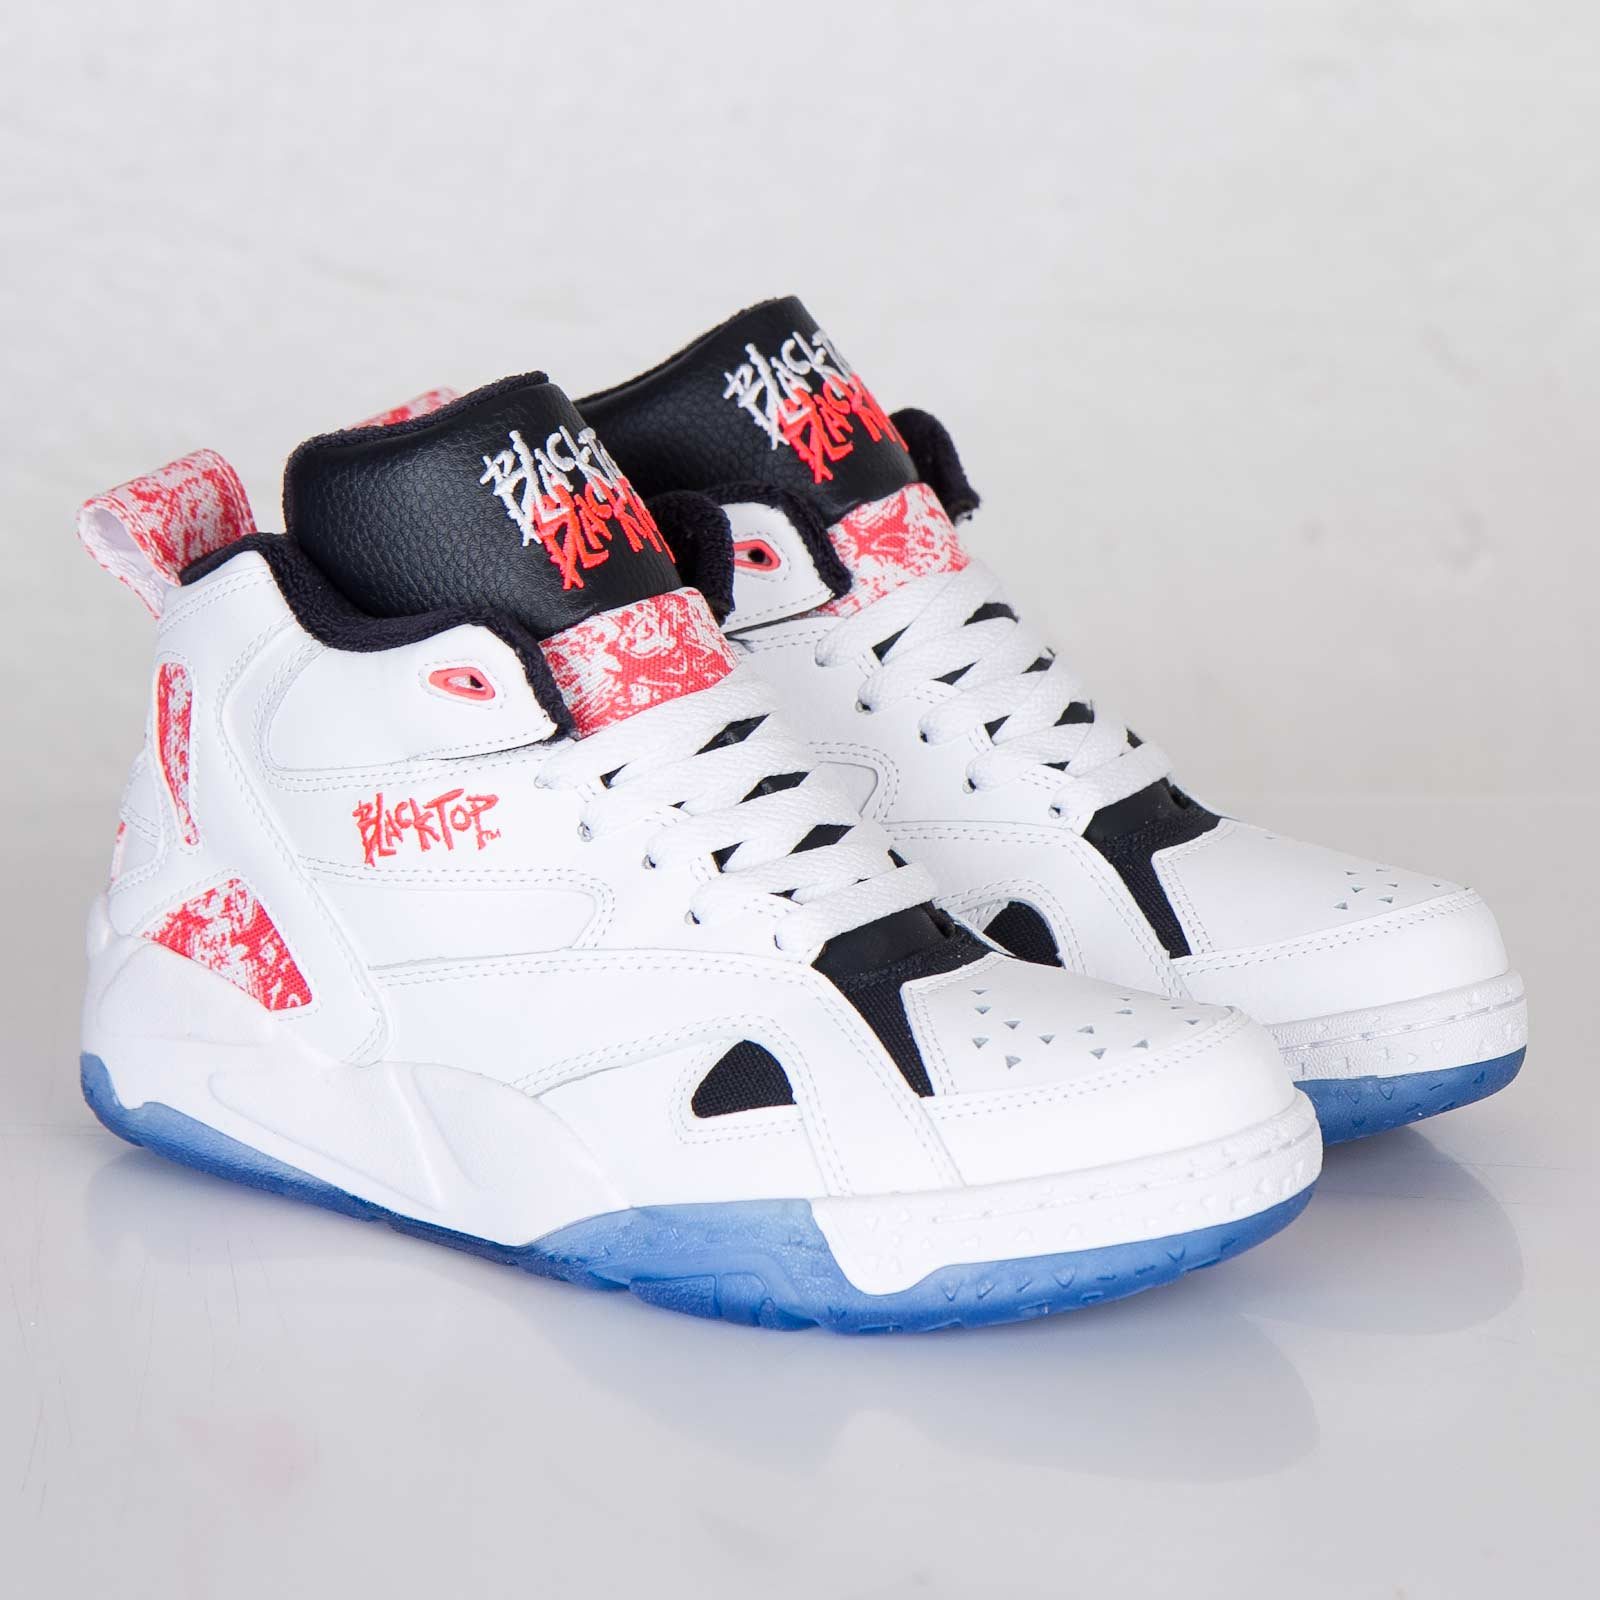 Reebok Blacktop Boulevard Color  White Punch Pink Reebok Navy Style  V56085  Price   115.00 2932a8a9a